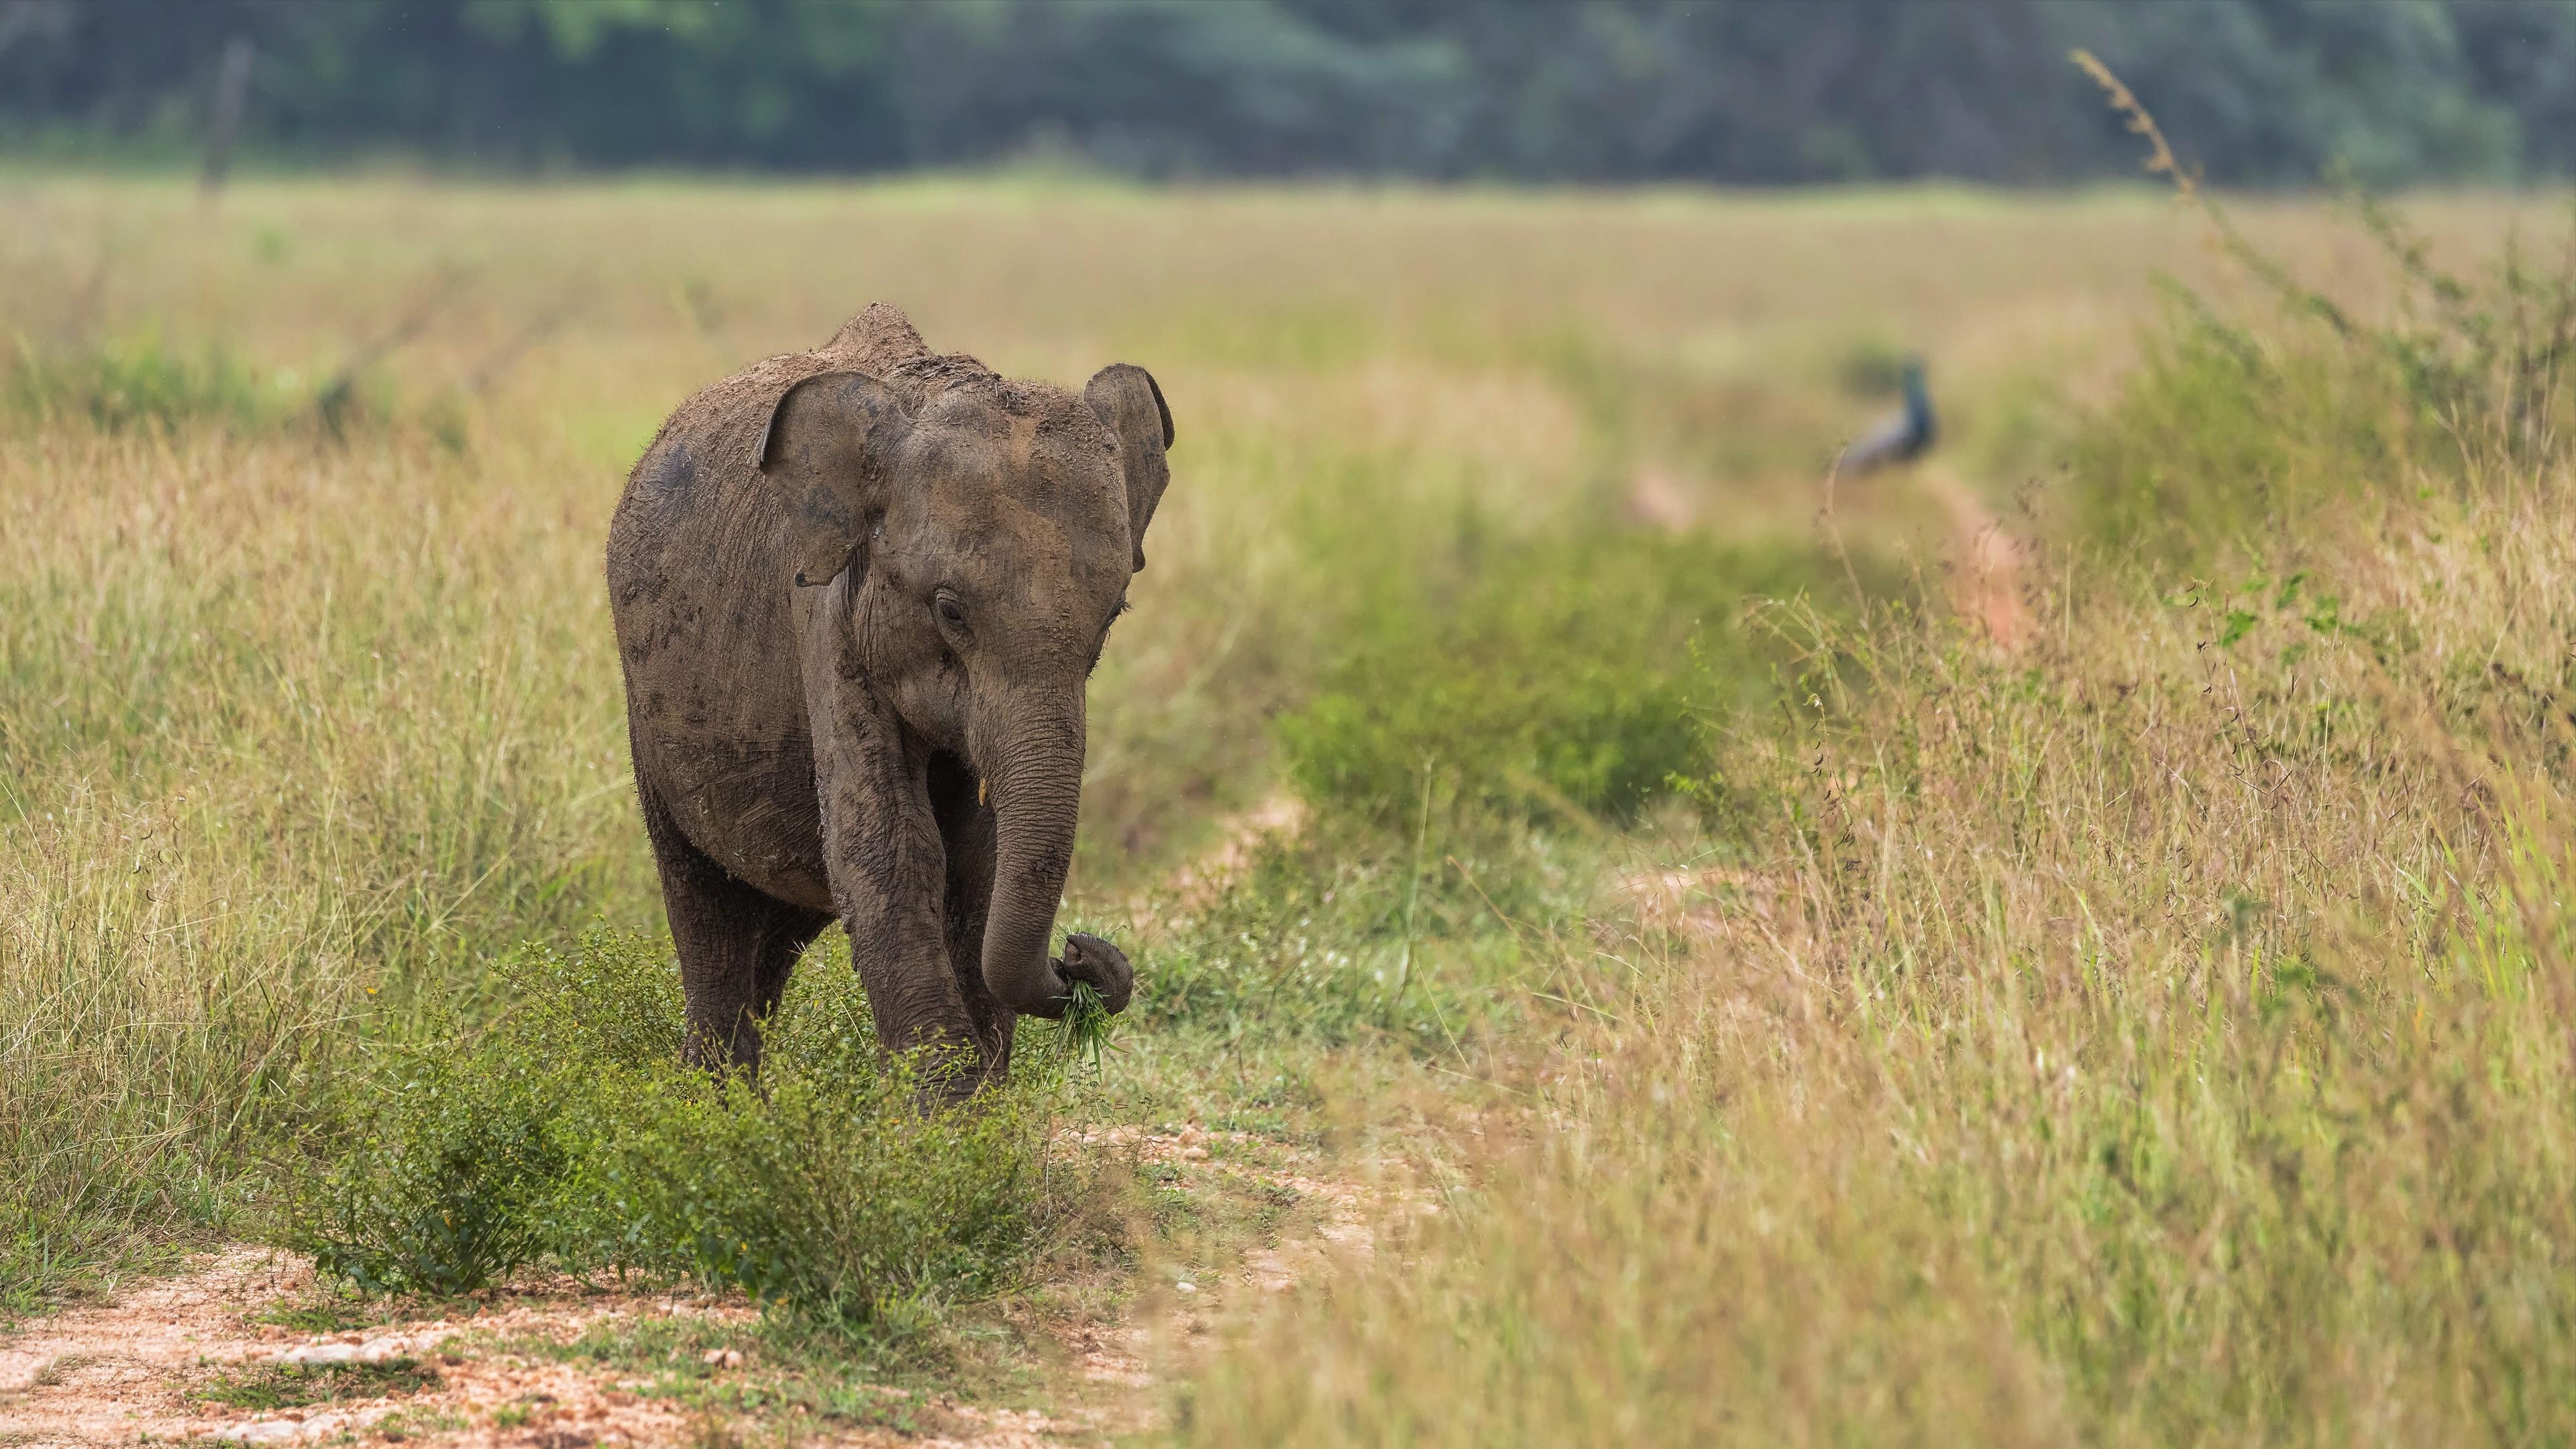 Baby Animal Elephant 3840x2160